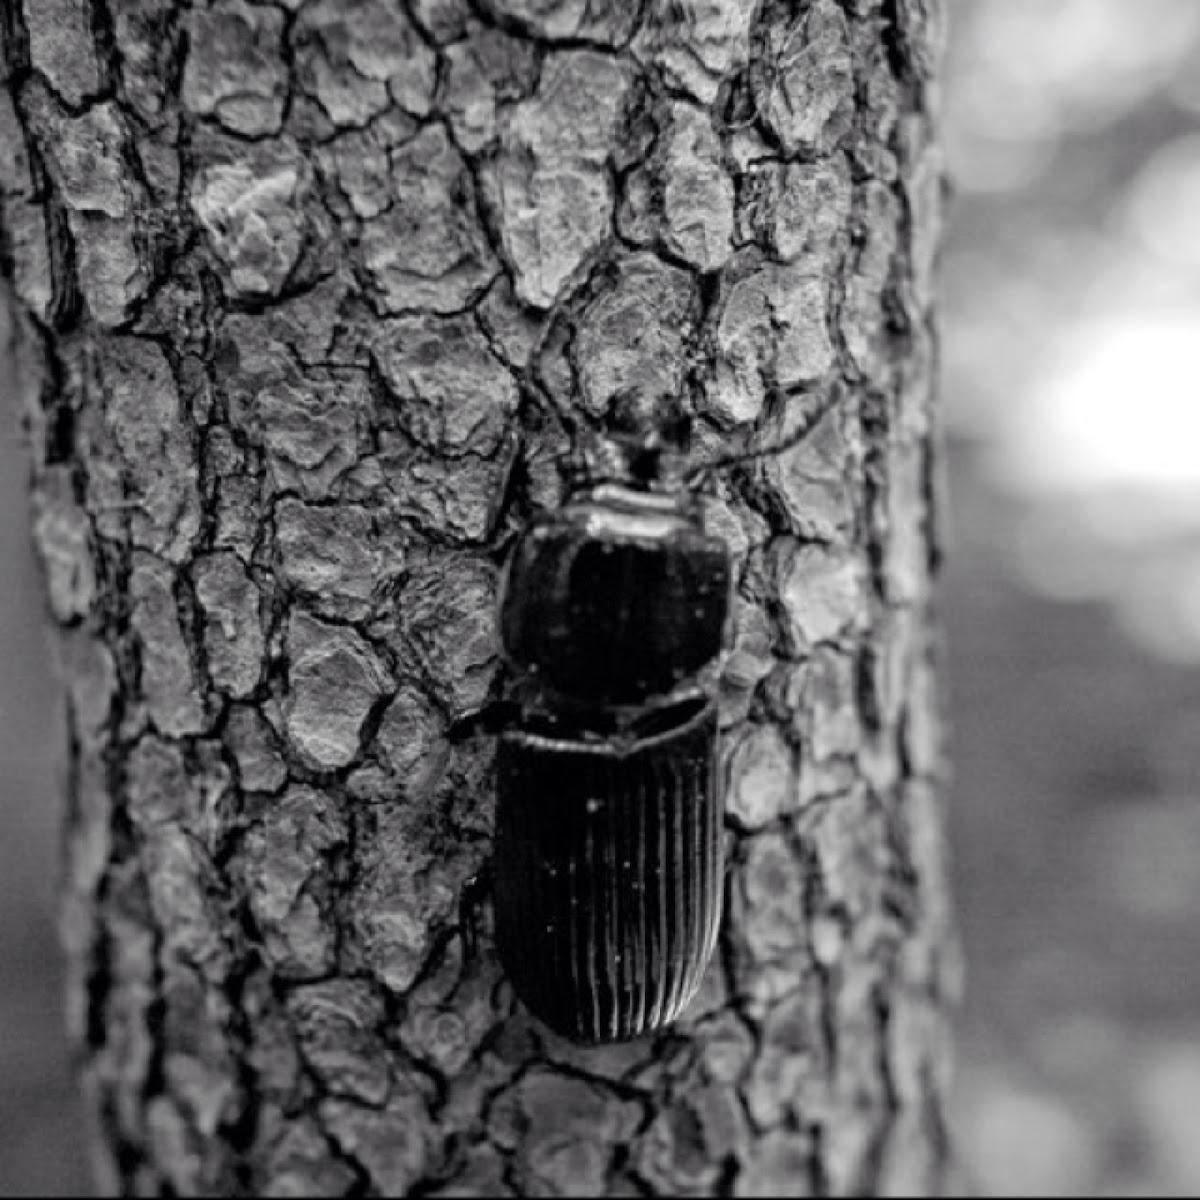 Horned Passalus Beetle; Betsy Beetle